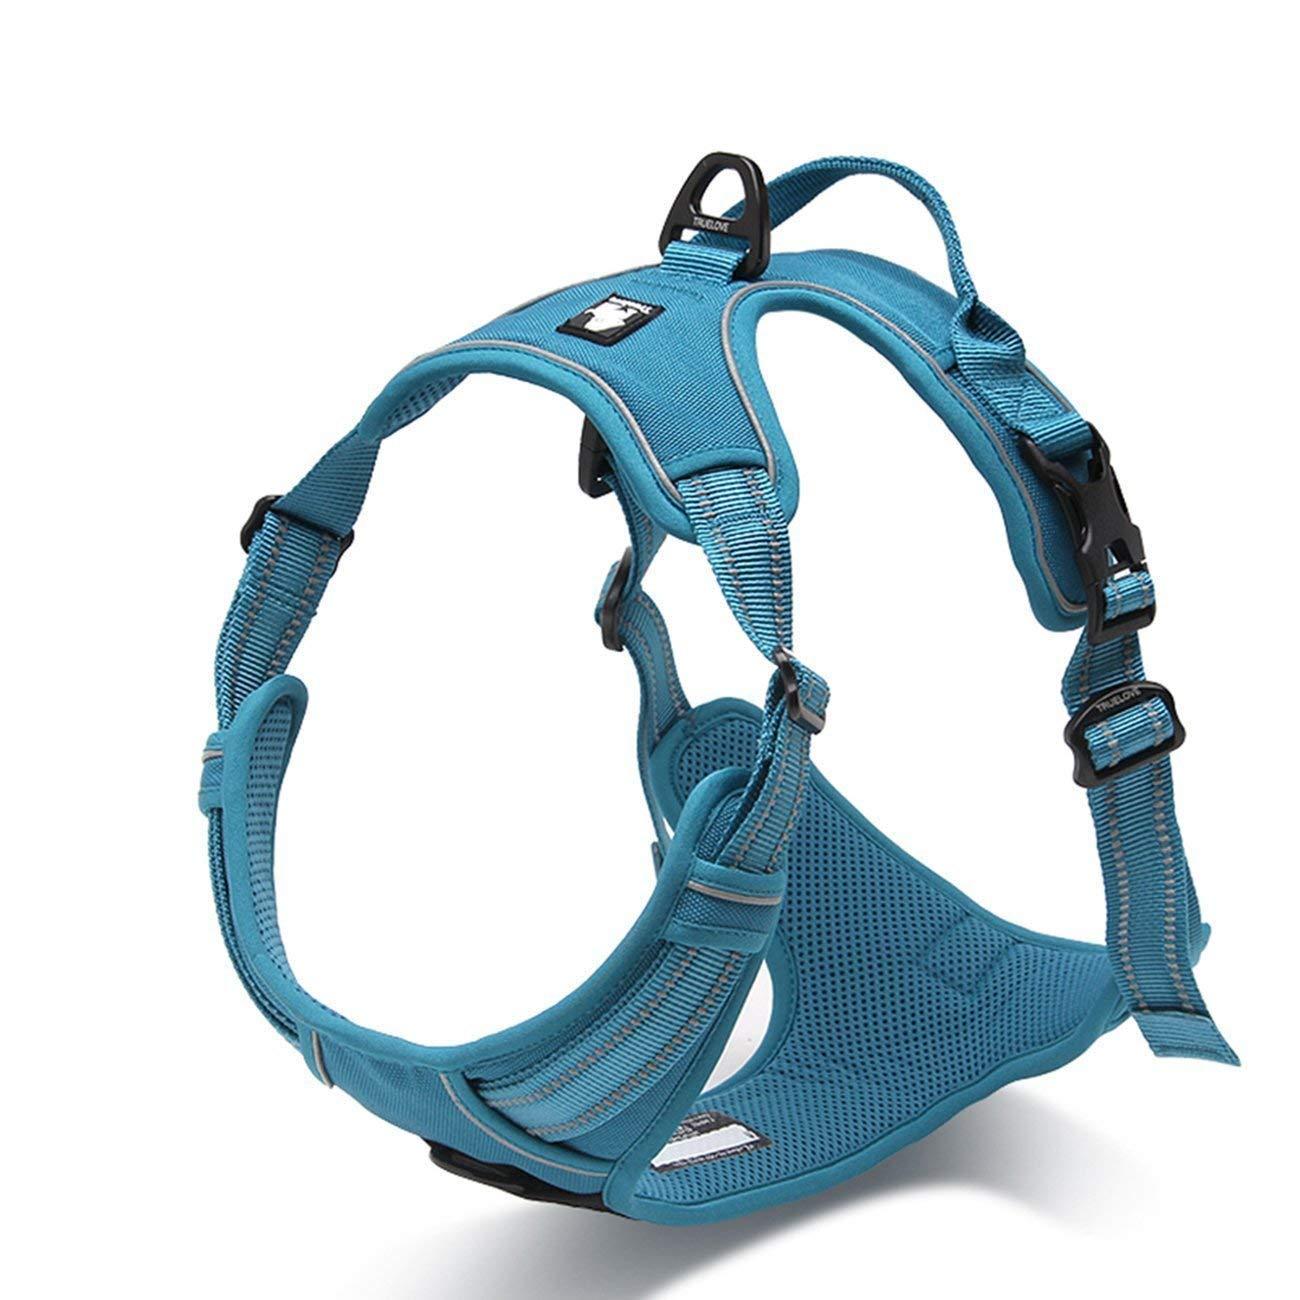 TRUE LOVE Adjustable No-Pull Dog Harness Reflective Pup Vest Harnesses Comfortable Control Brilliant Colors Truelove TLH5651(Blue,L) by TRUE LOVE